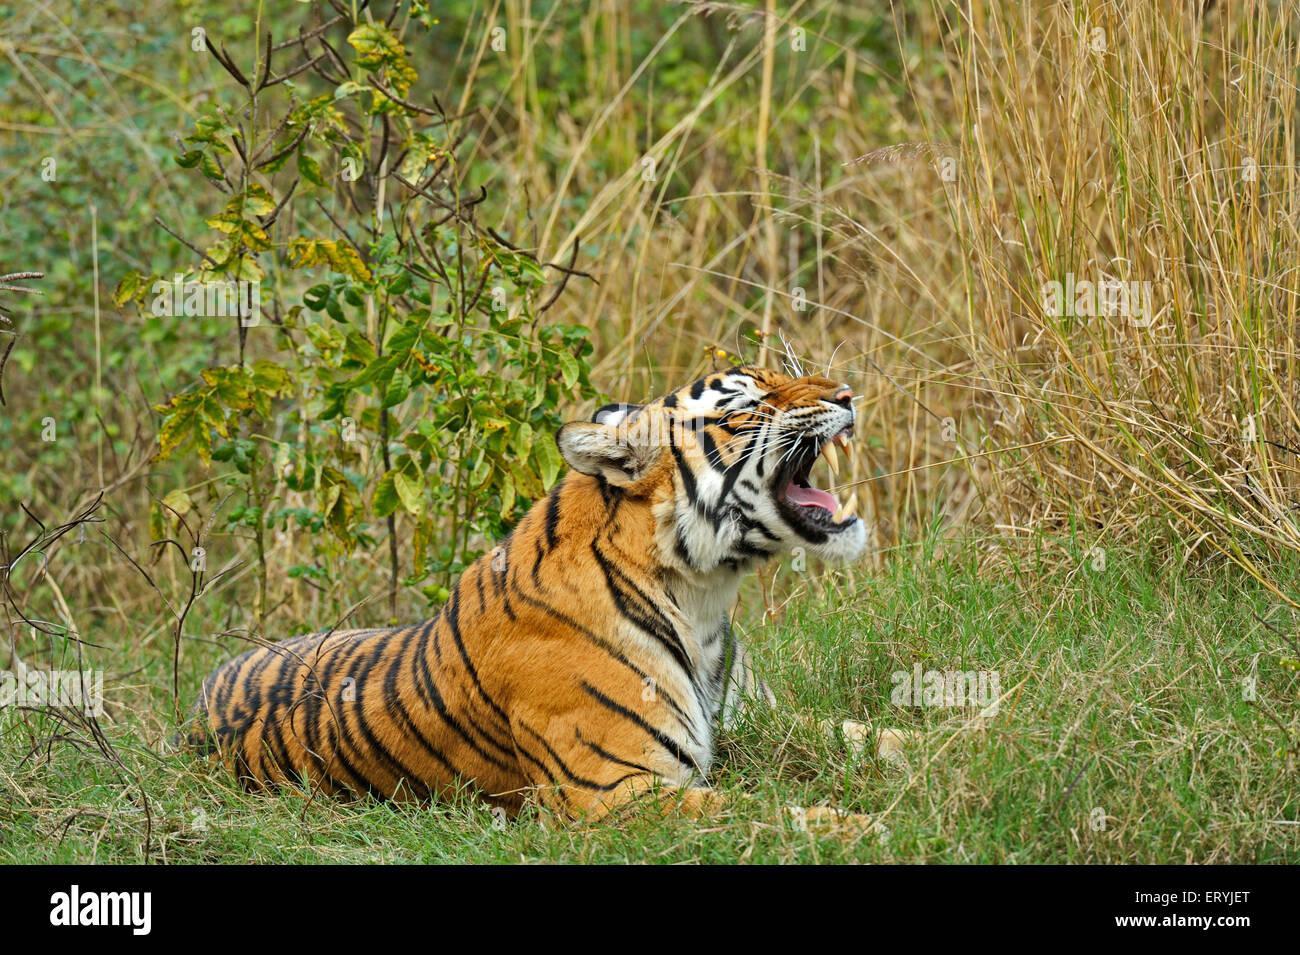 Tiger panthera tigris tigris snarling ; Ranthambore national park ; Rajasthan ; India - Stock Image